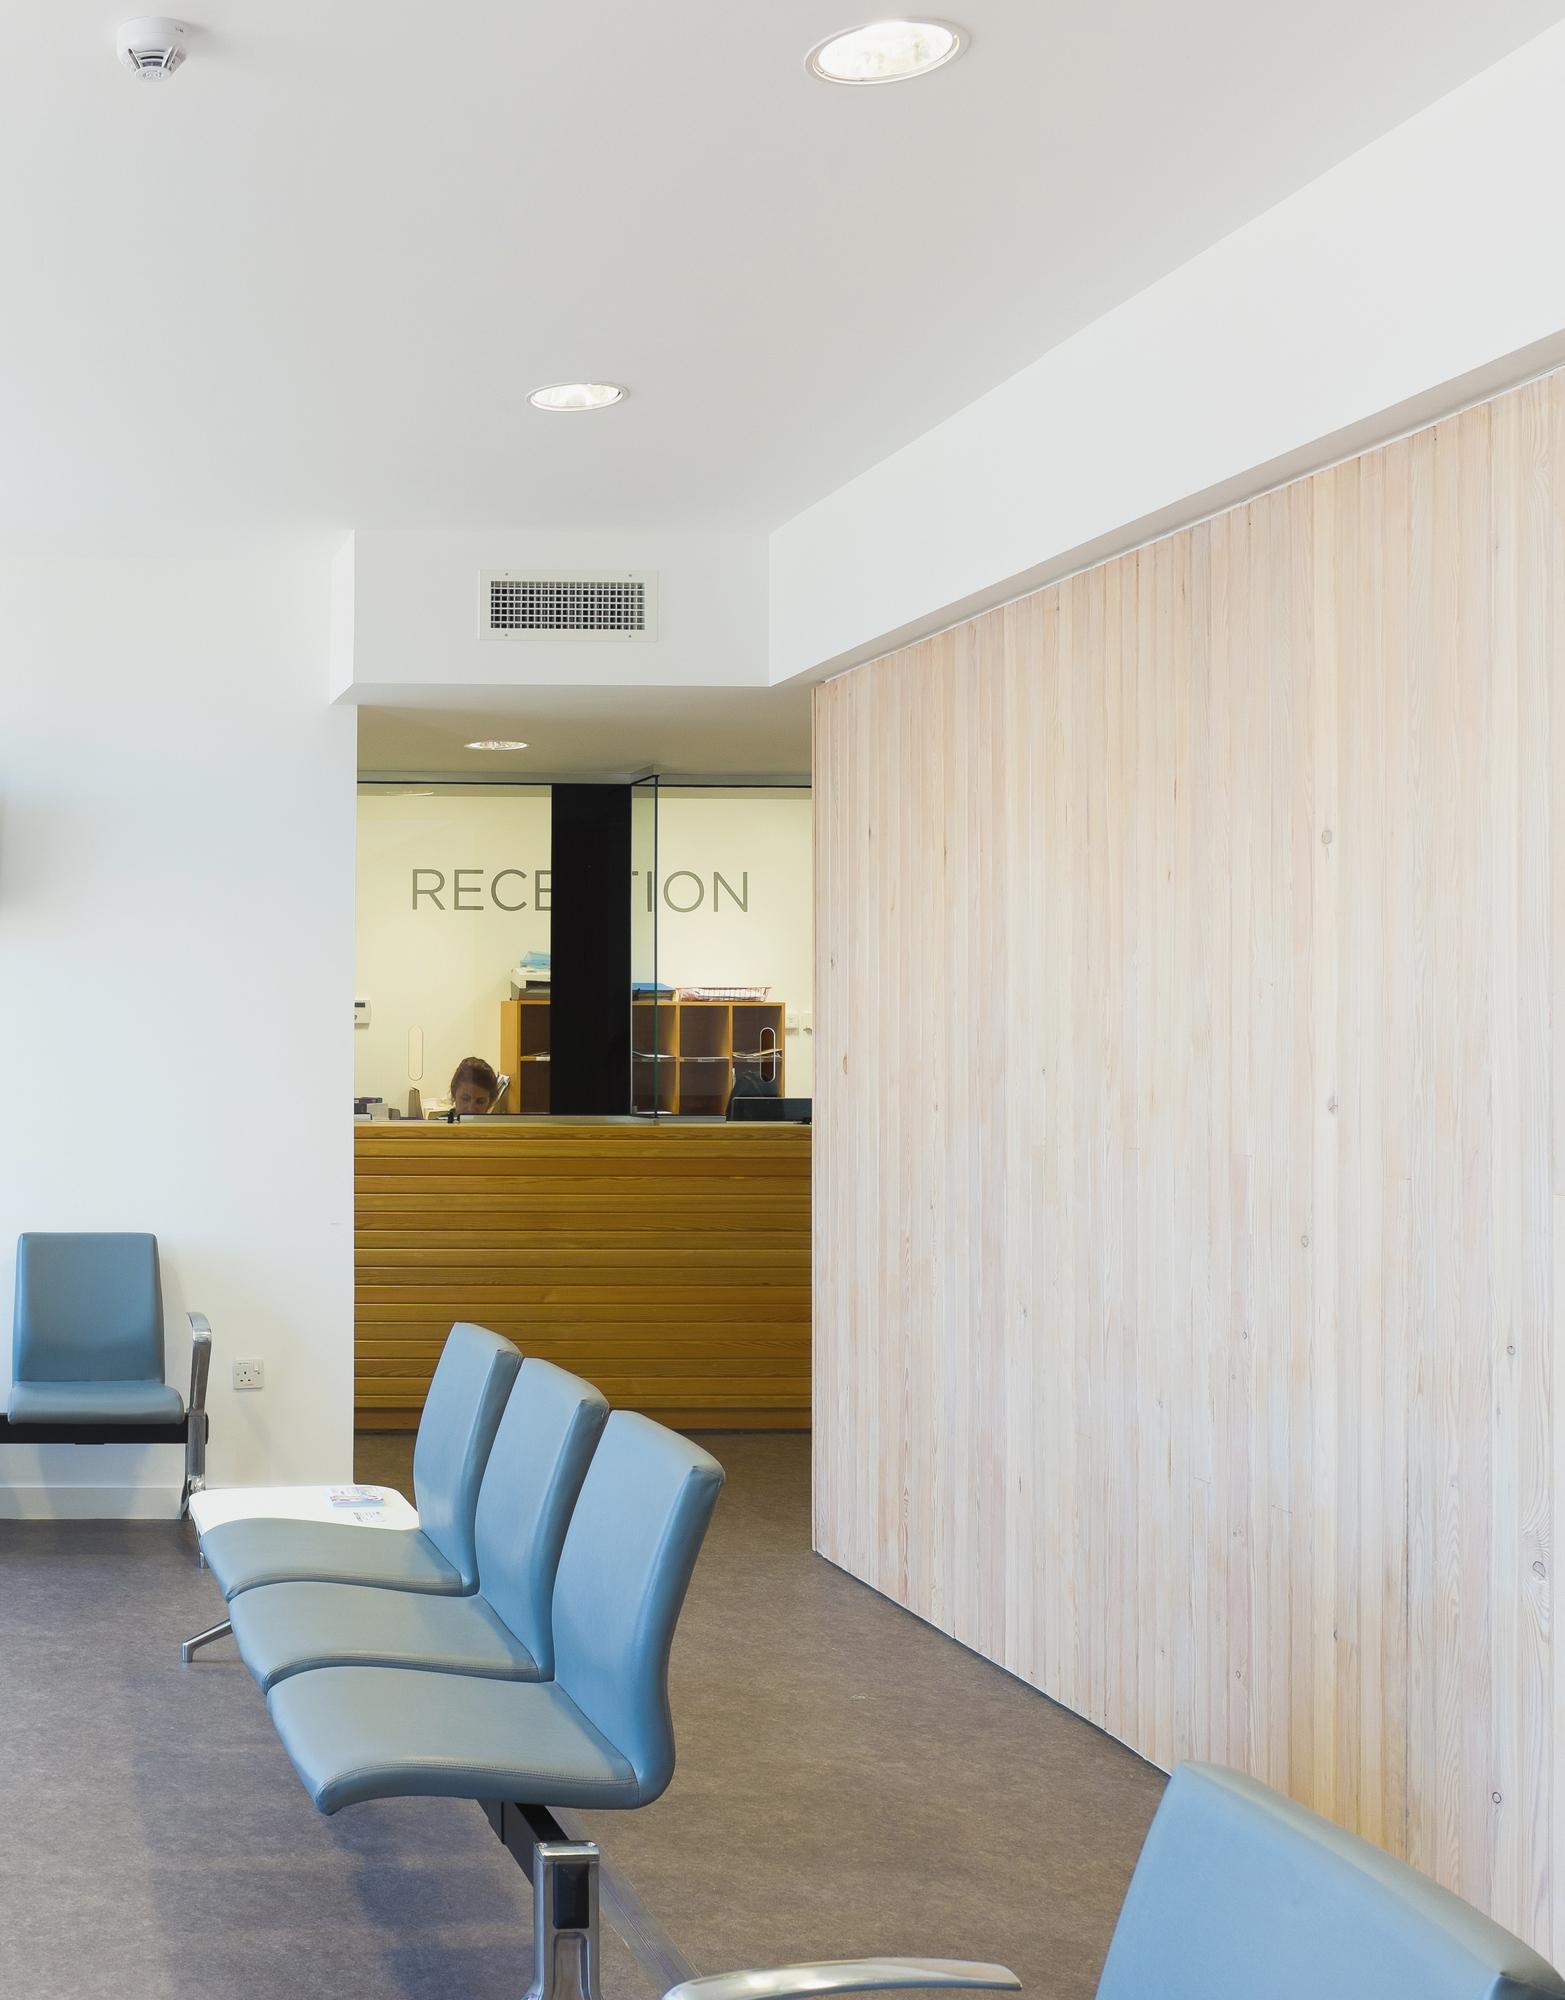 South Beach Medical Centre Ardrossan